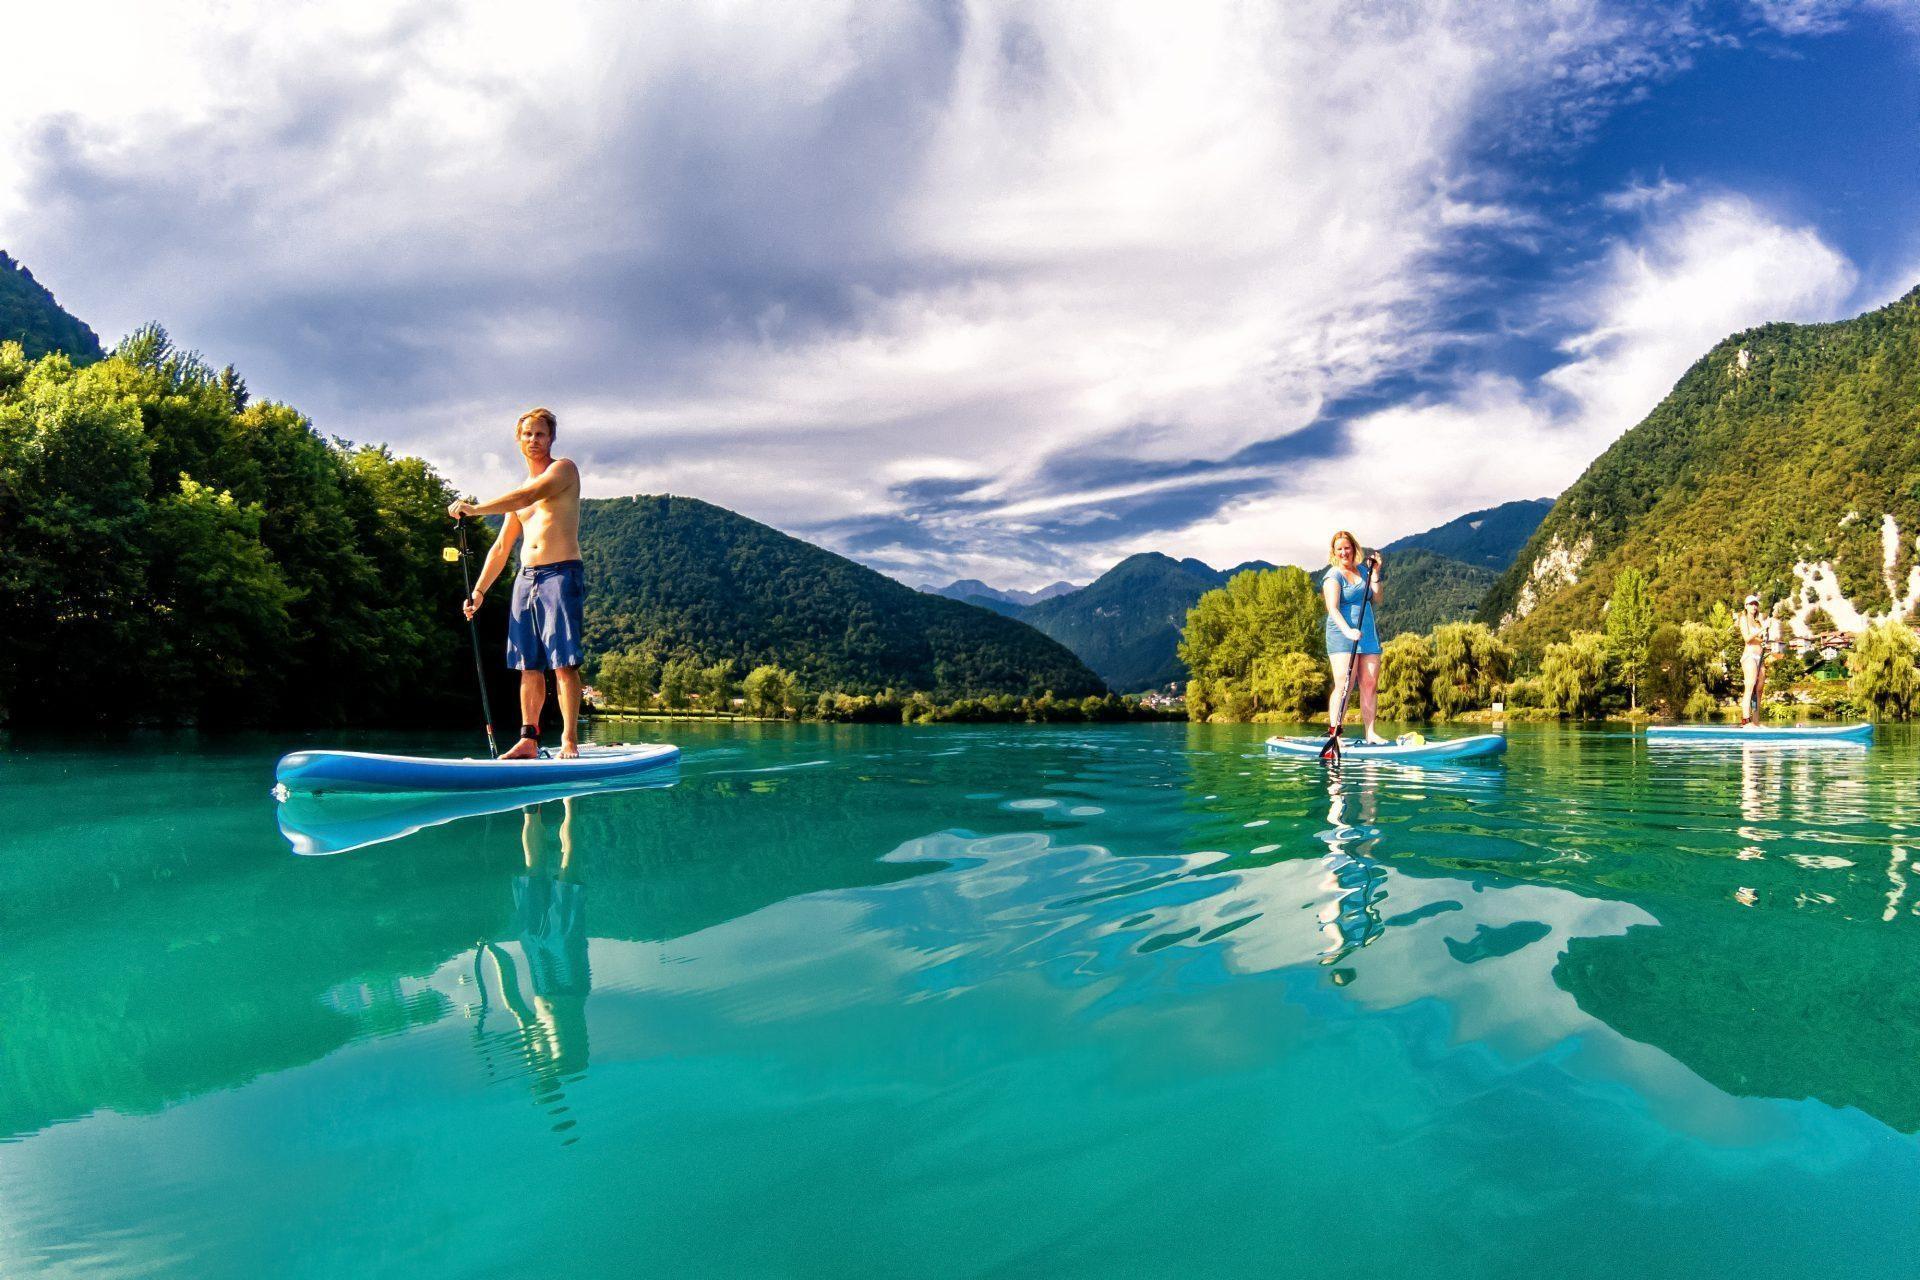 Sup tour Soca river, Soca valley, Slovenia, Europe